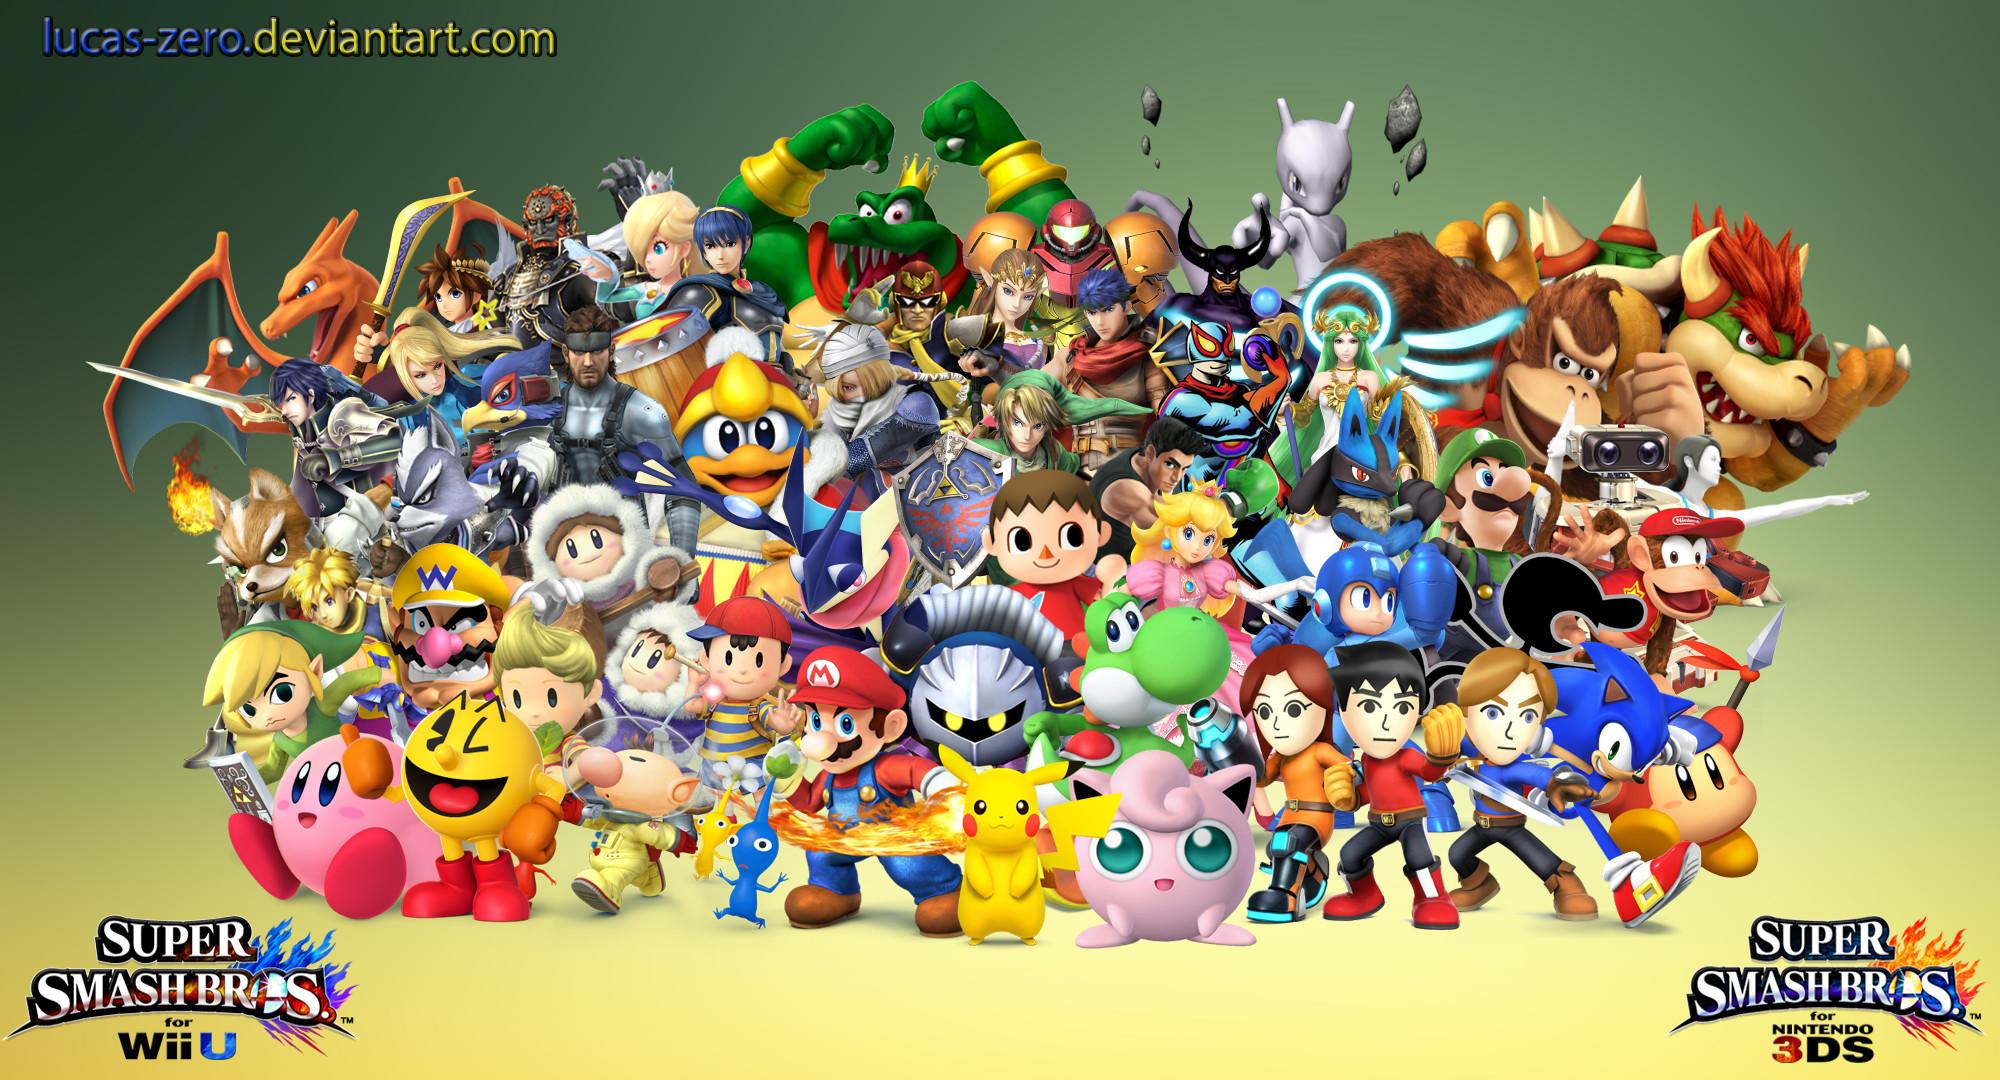 … Super Smash Bros 4 Dream Roster Wallpaper by Lucas-Zero